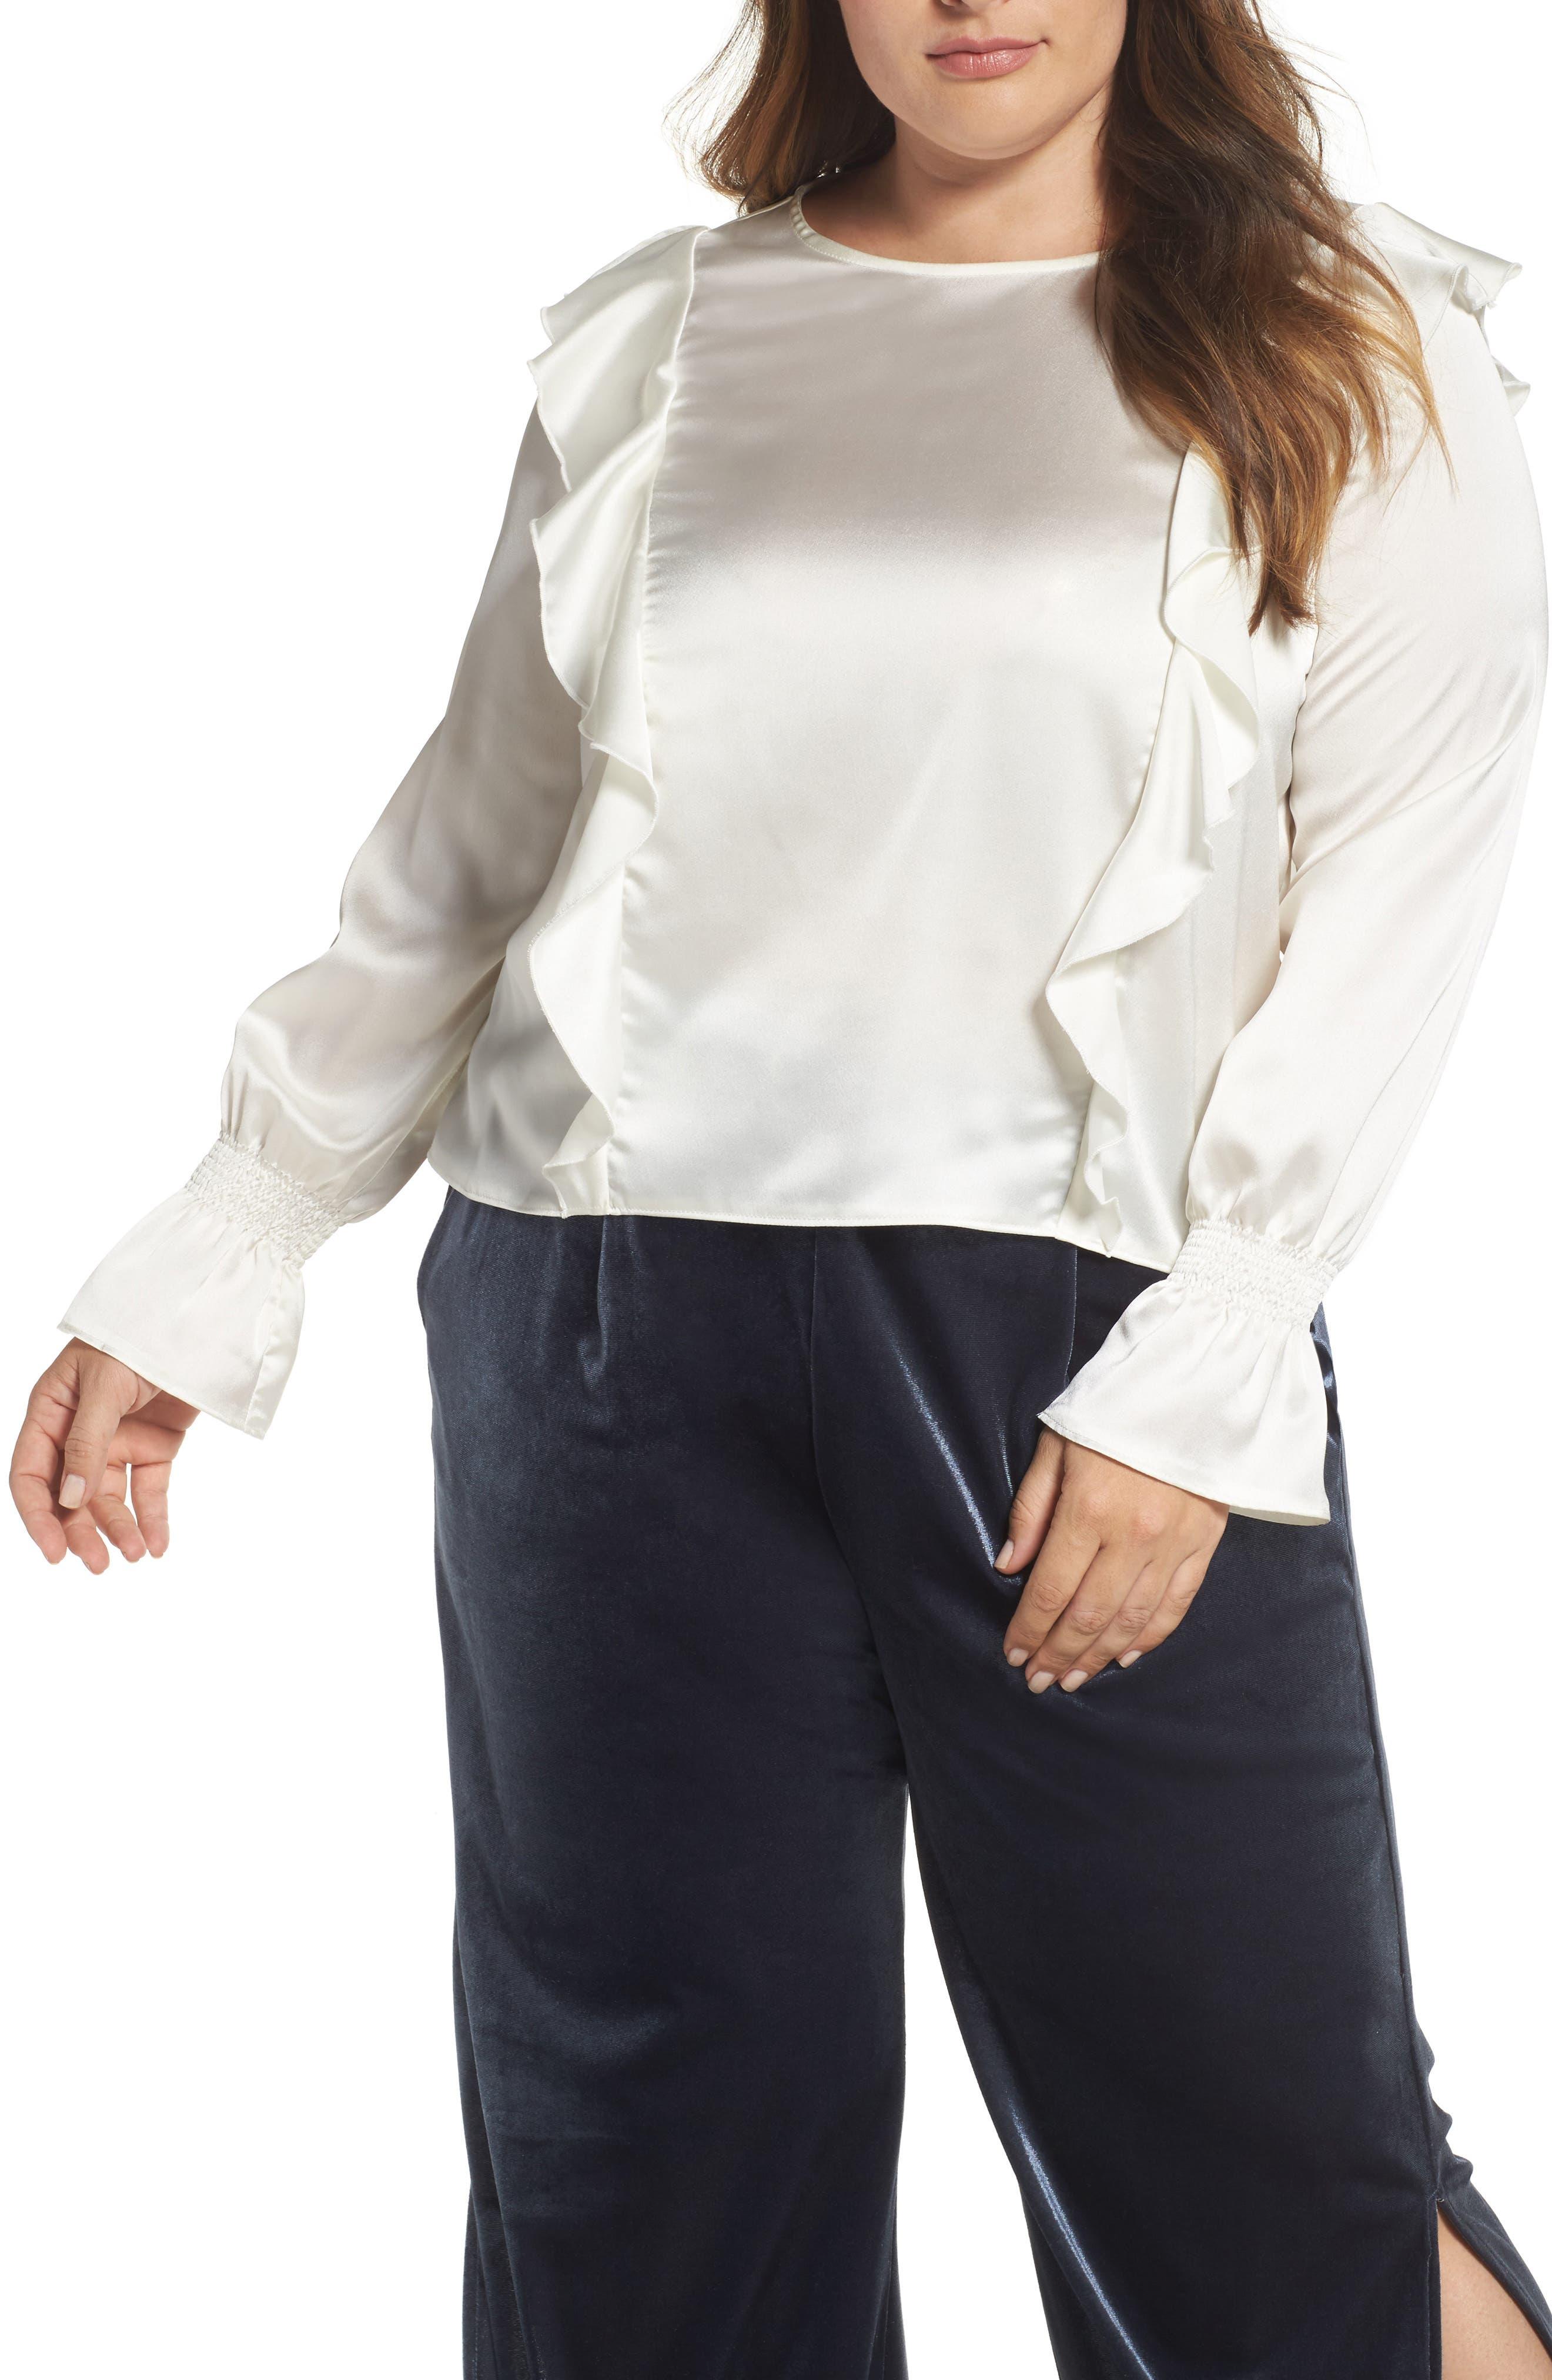 Main Image - ELVI Satin Ruffle Top (Plus Size)